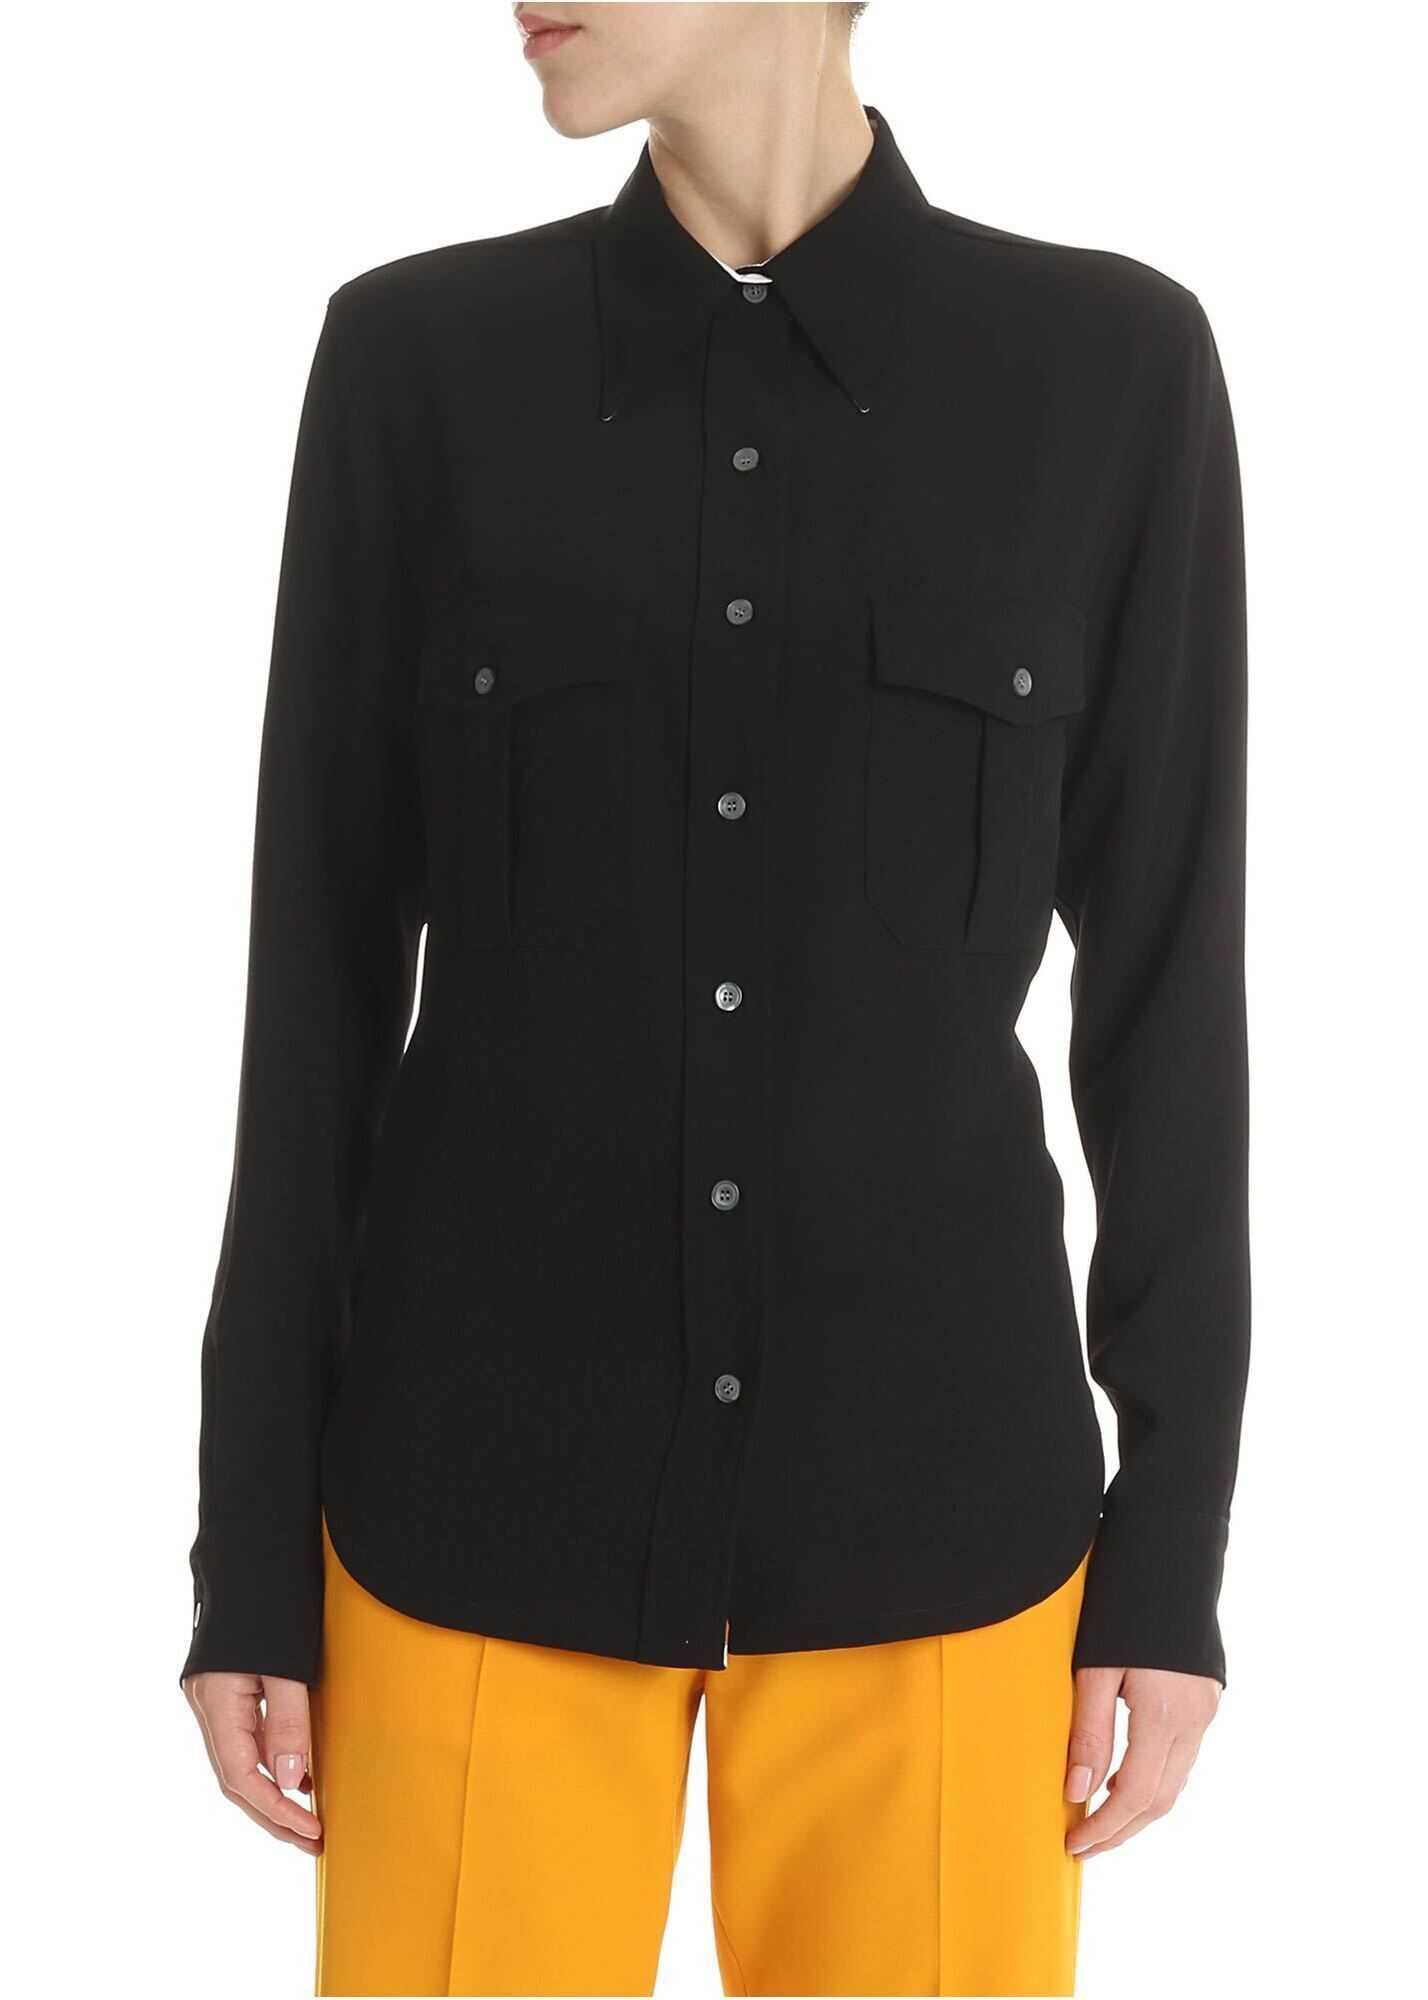 Calvin Klein Black Shirt In Diagonal Fabric Black